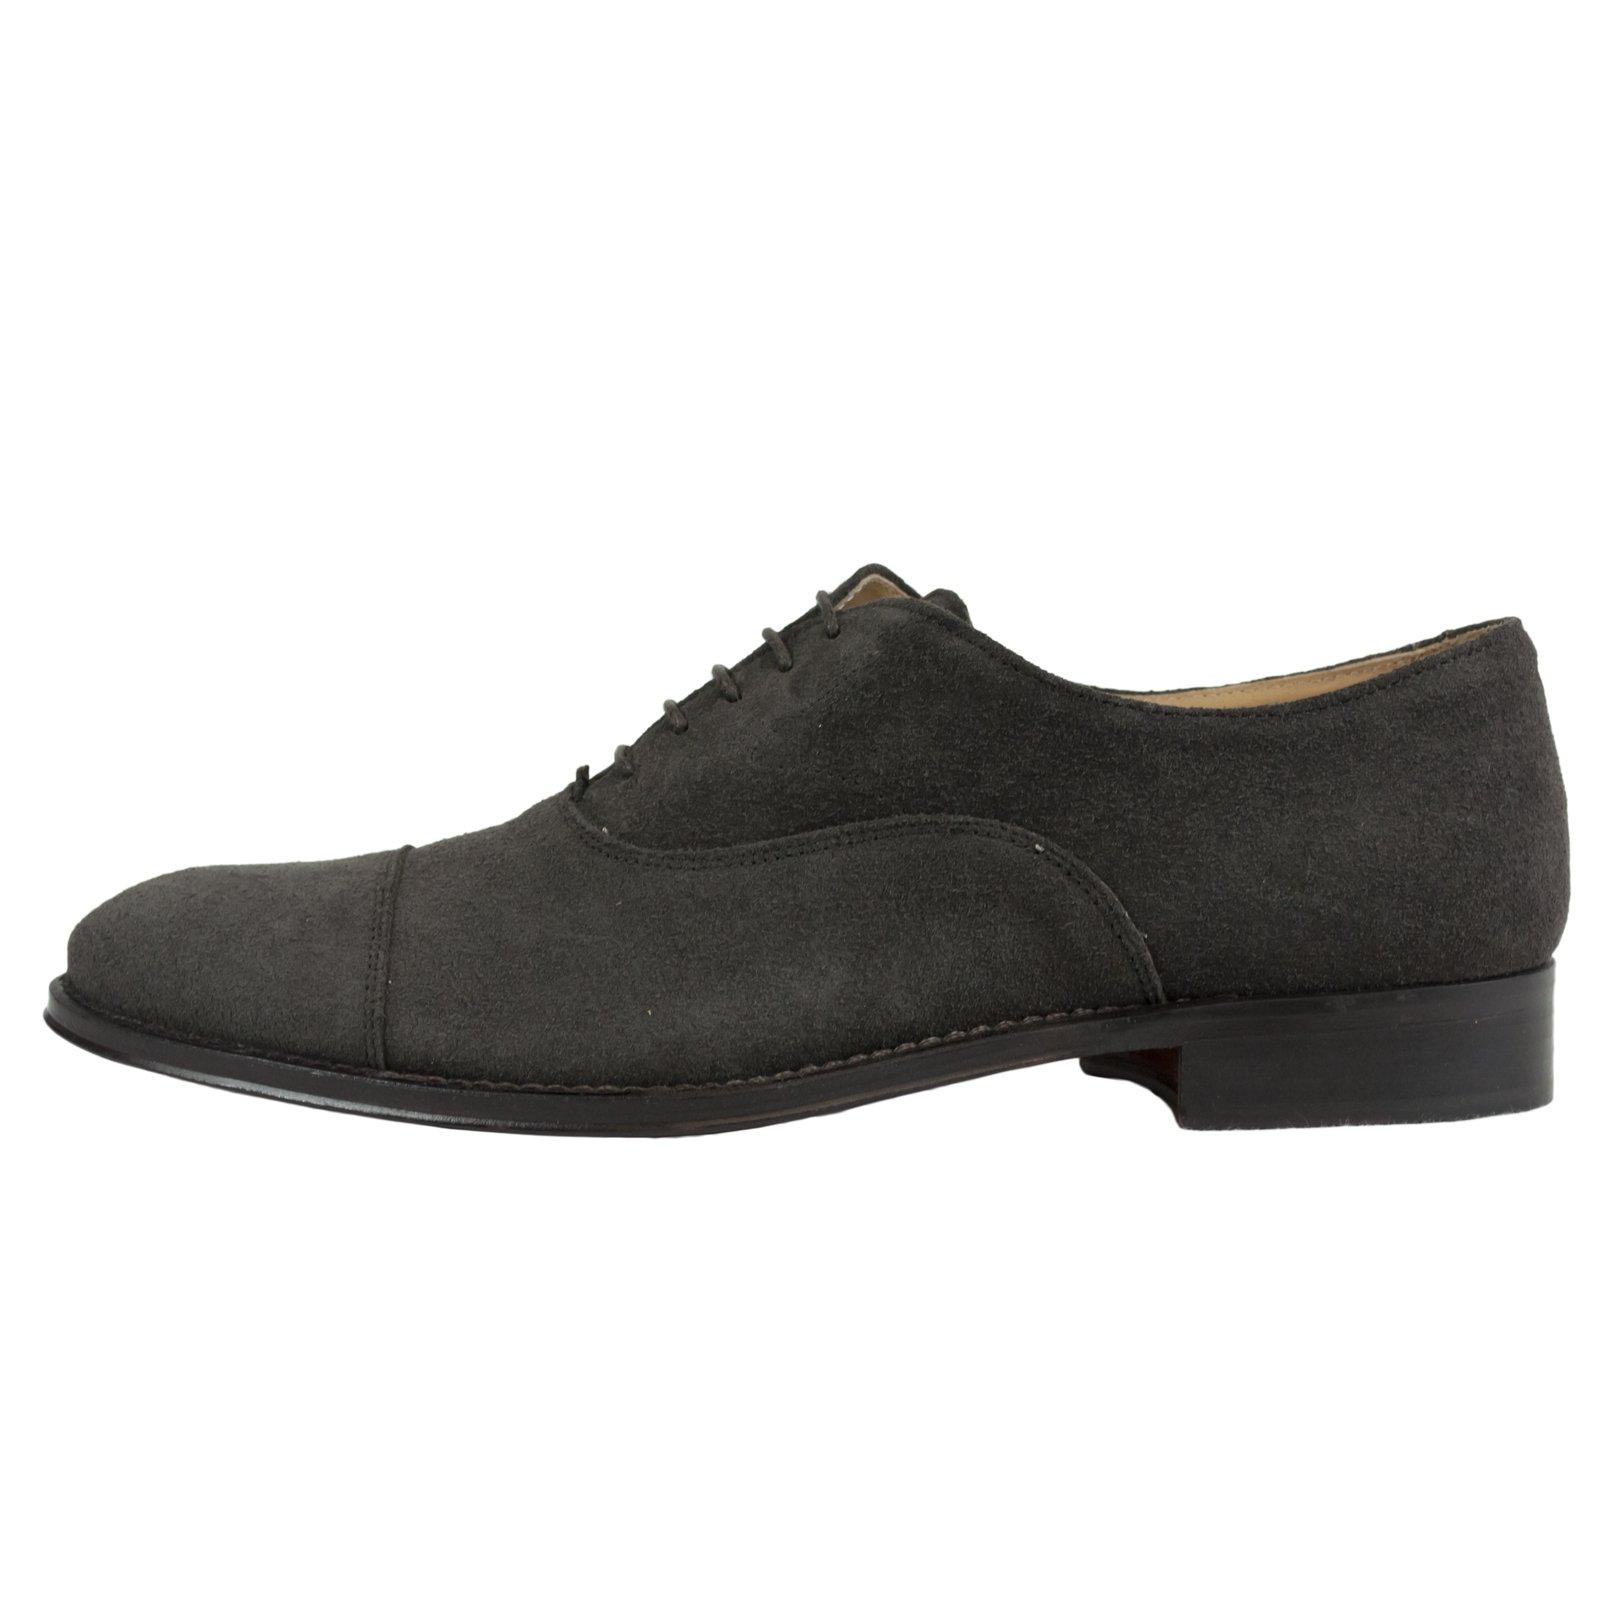 Saxone of Scotland Men's Suede Leather Laced Oxford Shoe Brown 350_Dark_Brown_Suede - EU40.5/US7.5